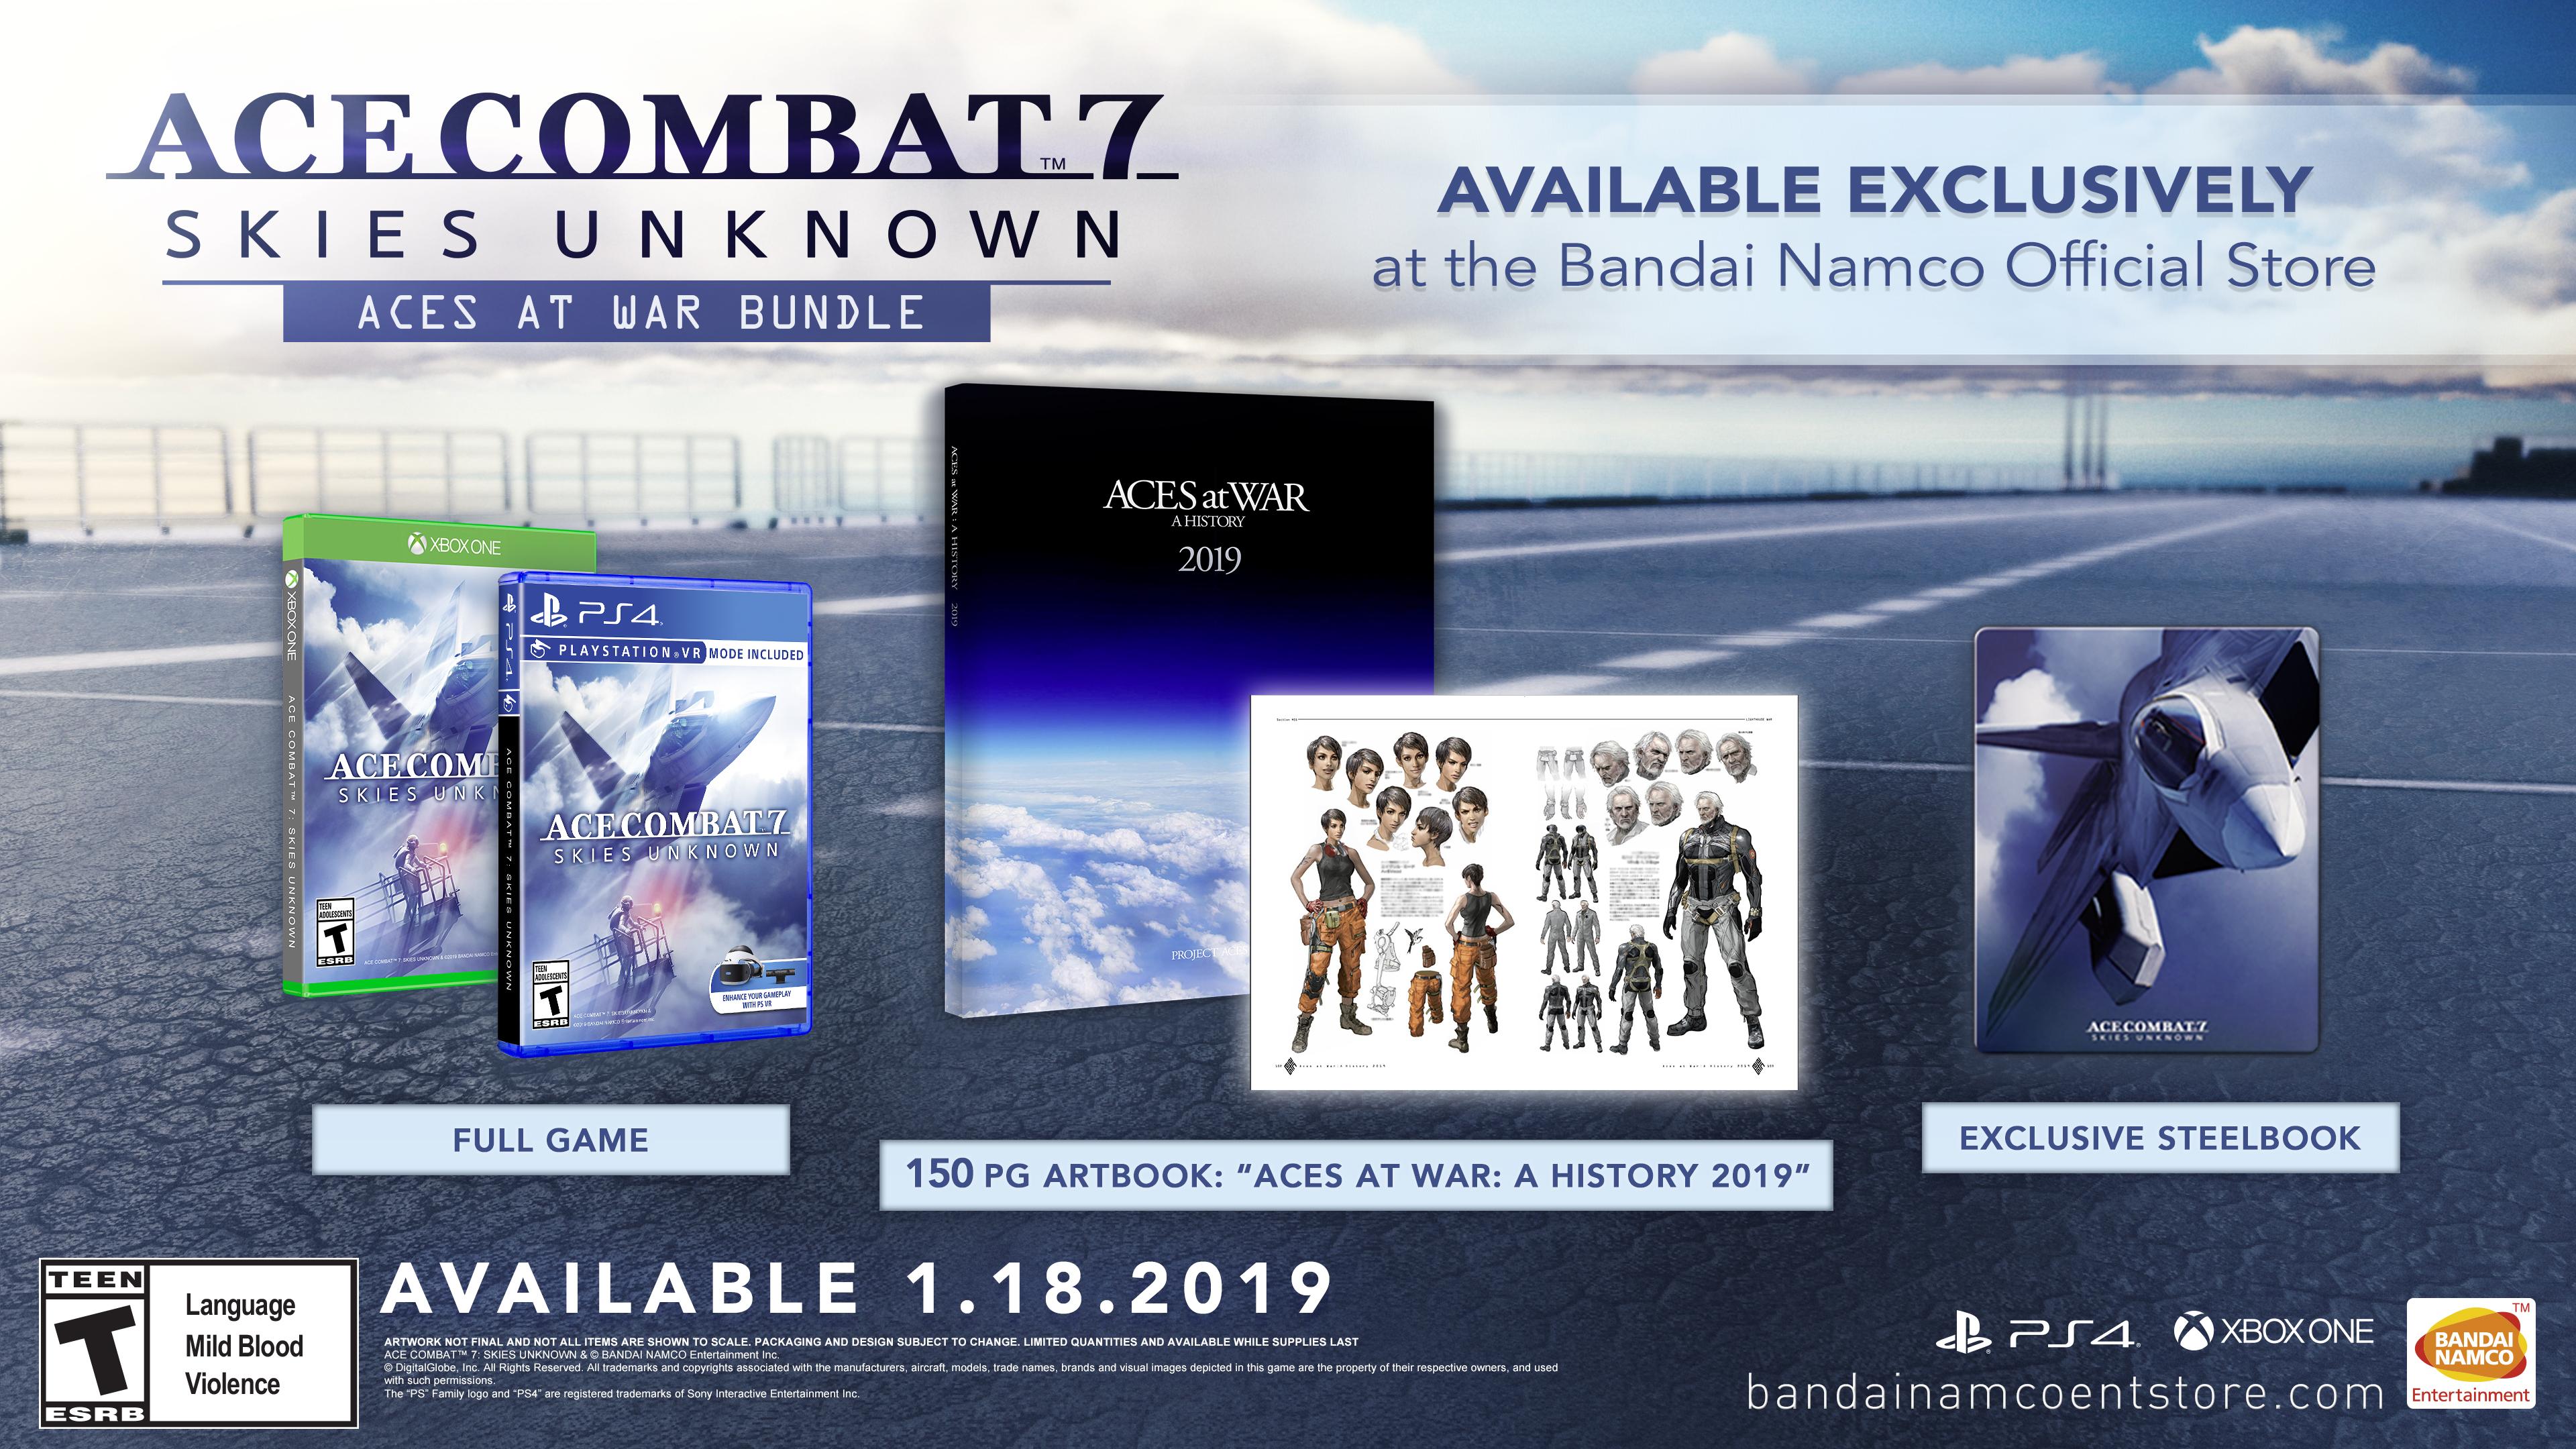 Ace Combat 7: Skies unknown - Aces at War Bundle